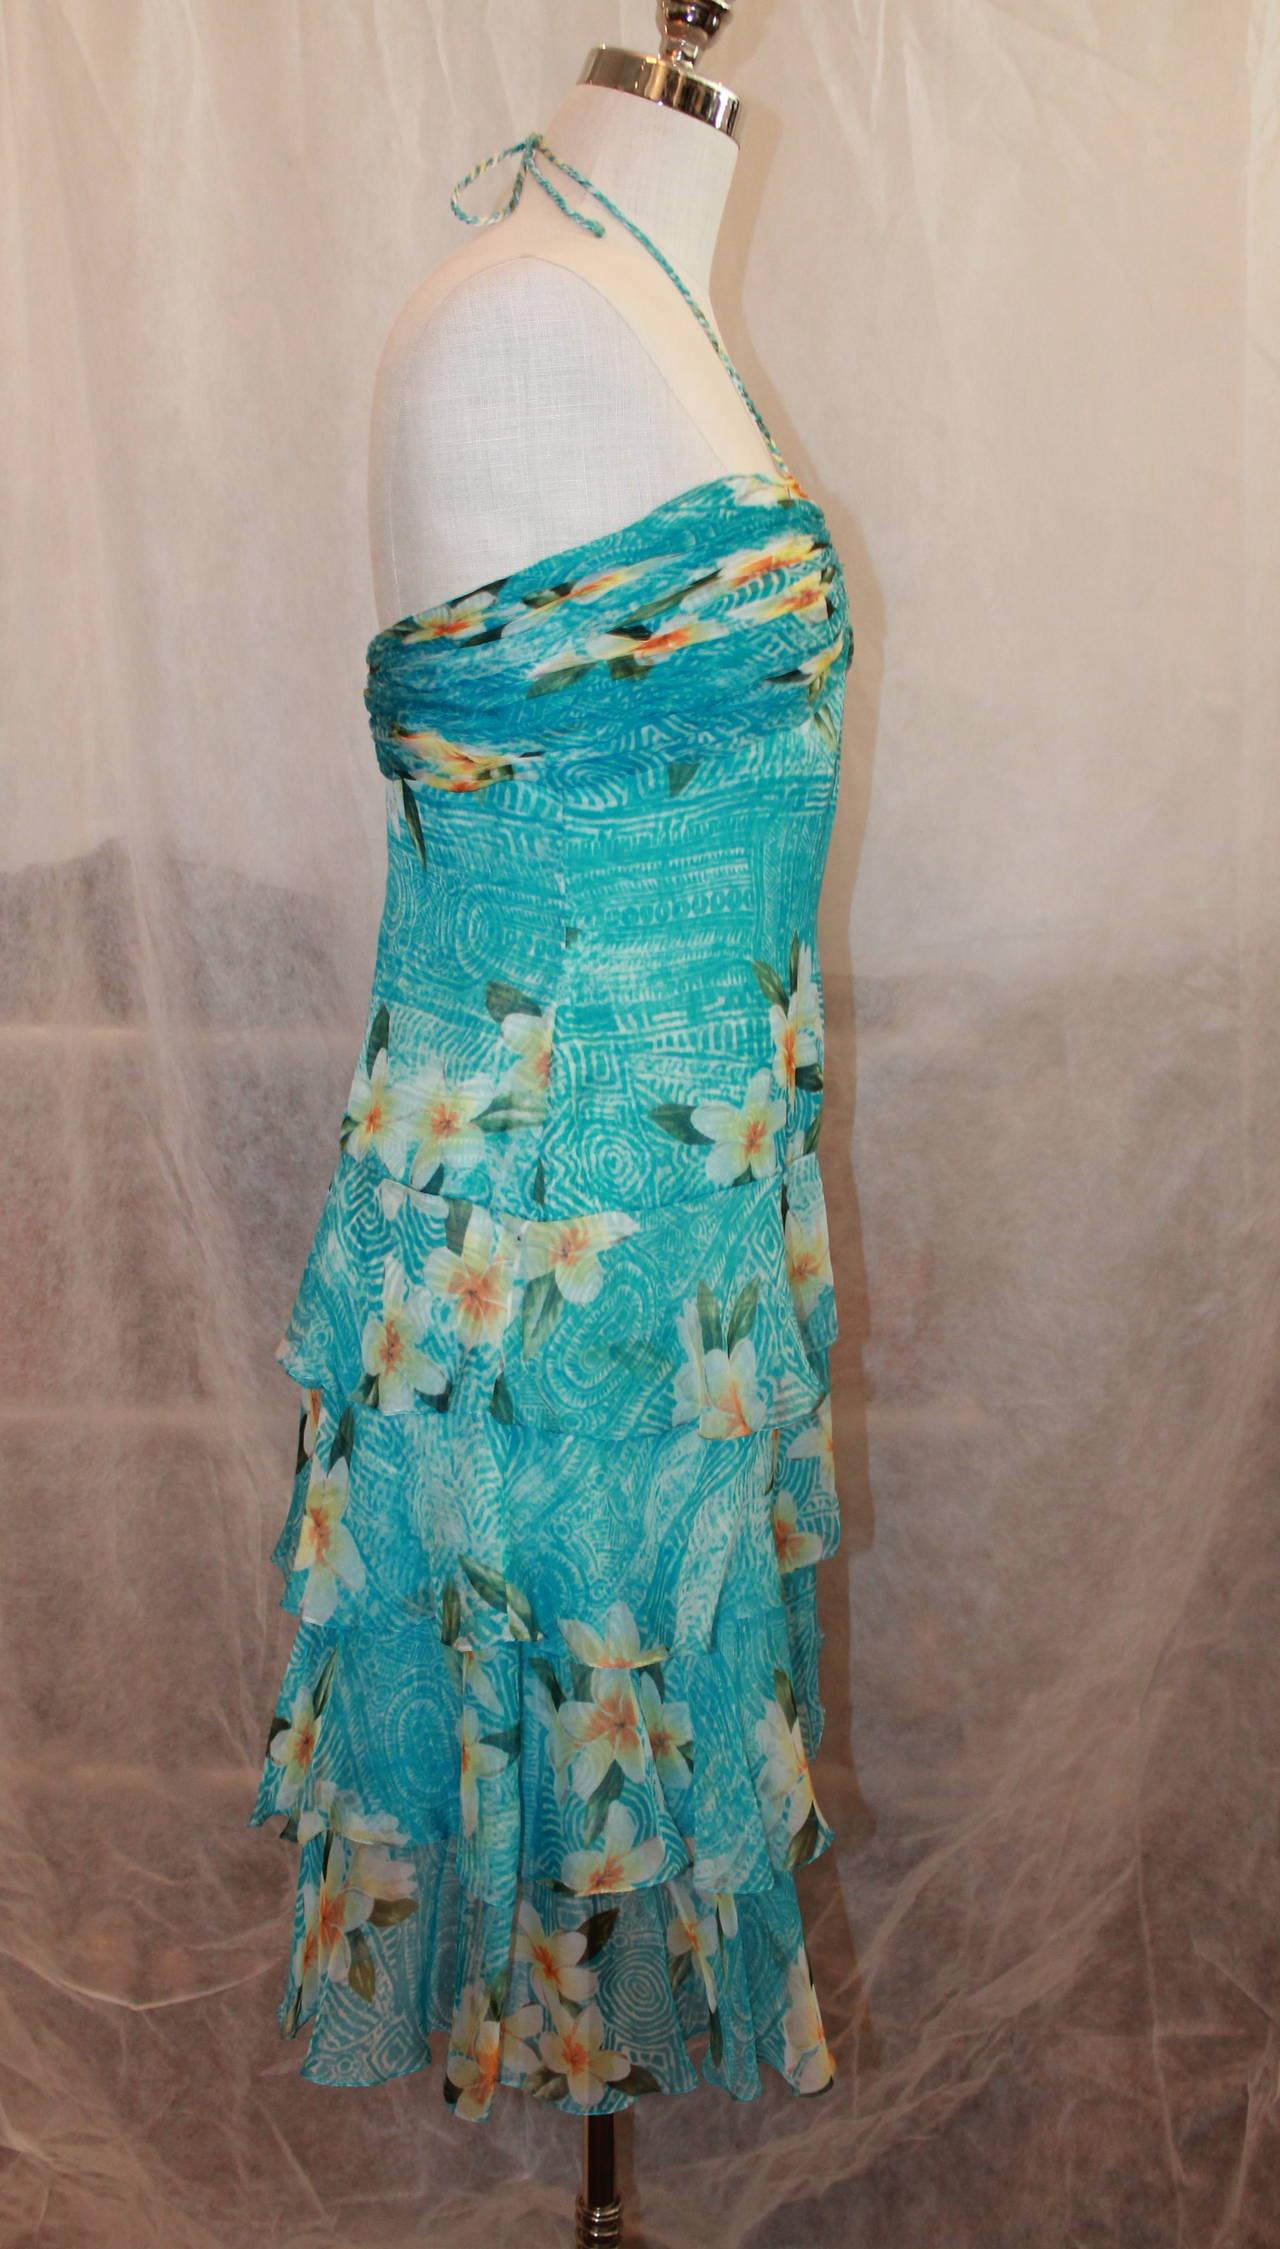 Women's Oscar de la Renta Blue Hawaiian Print Halter Dress & Shawl - 10 For Sale